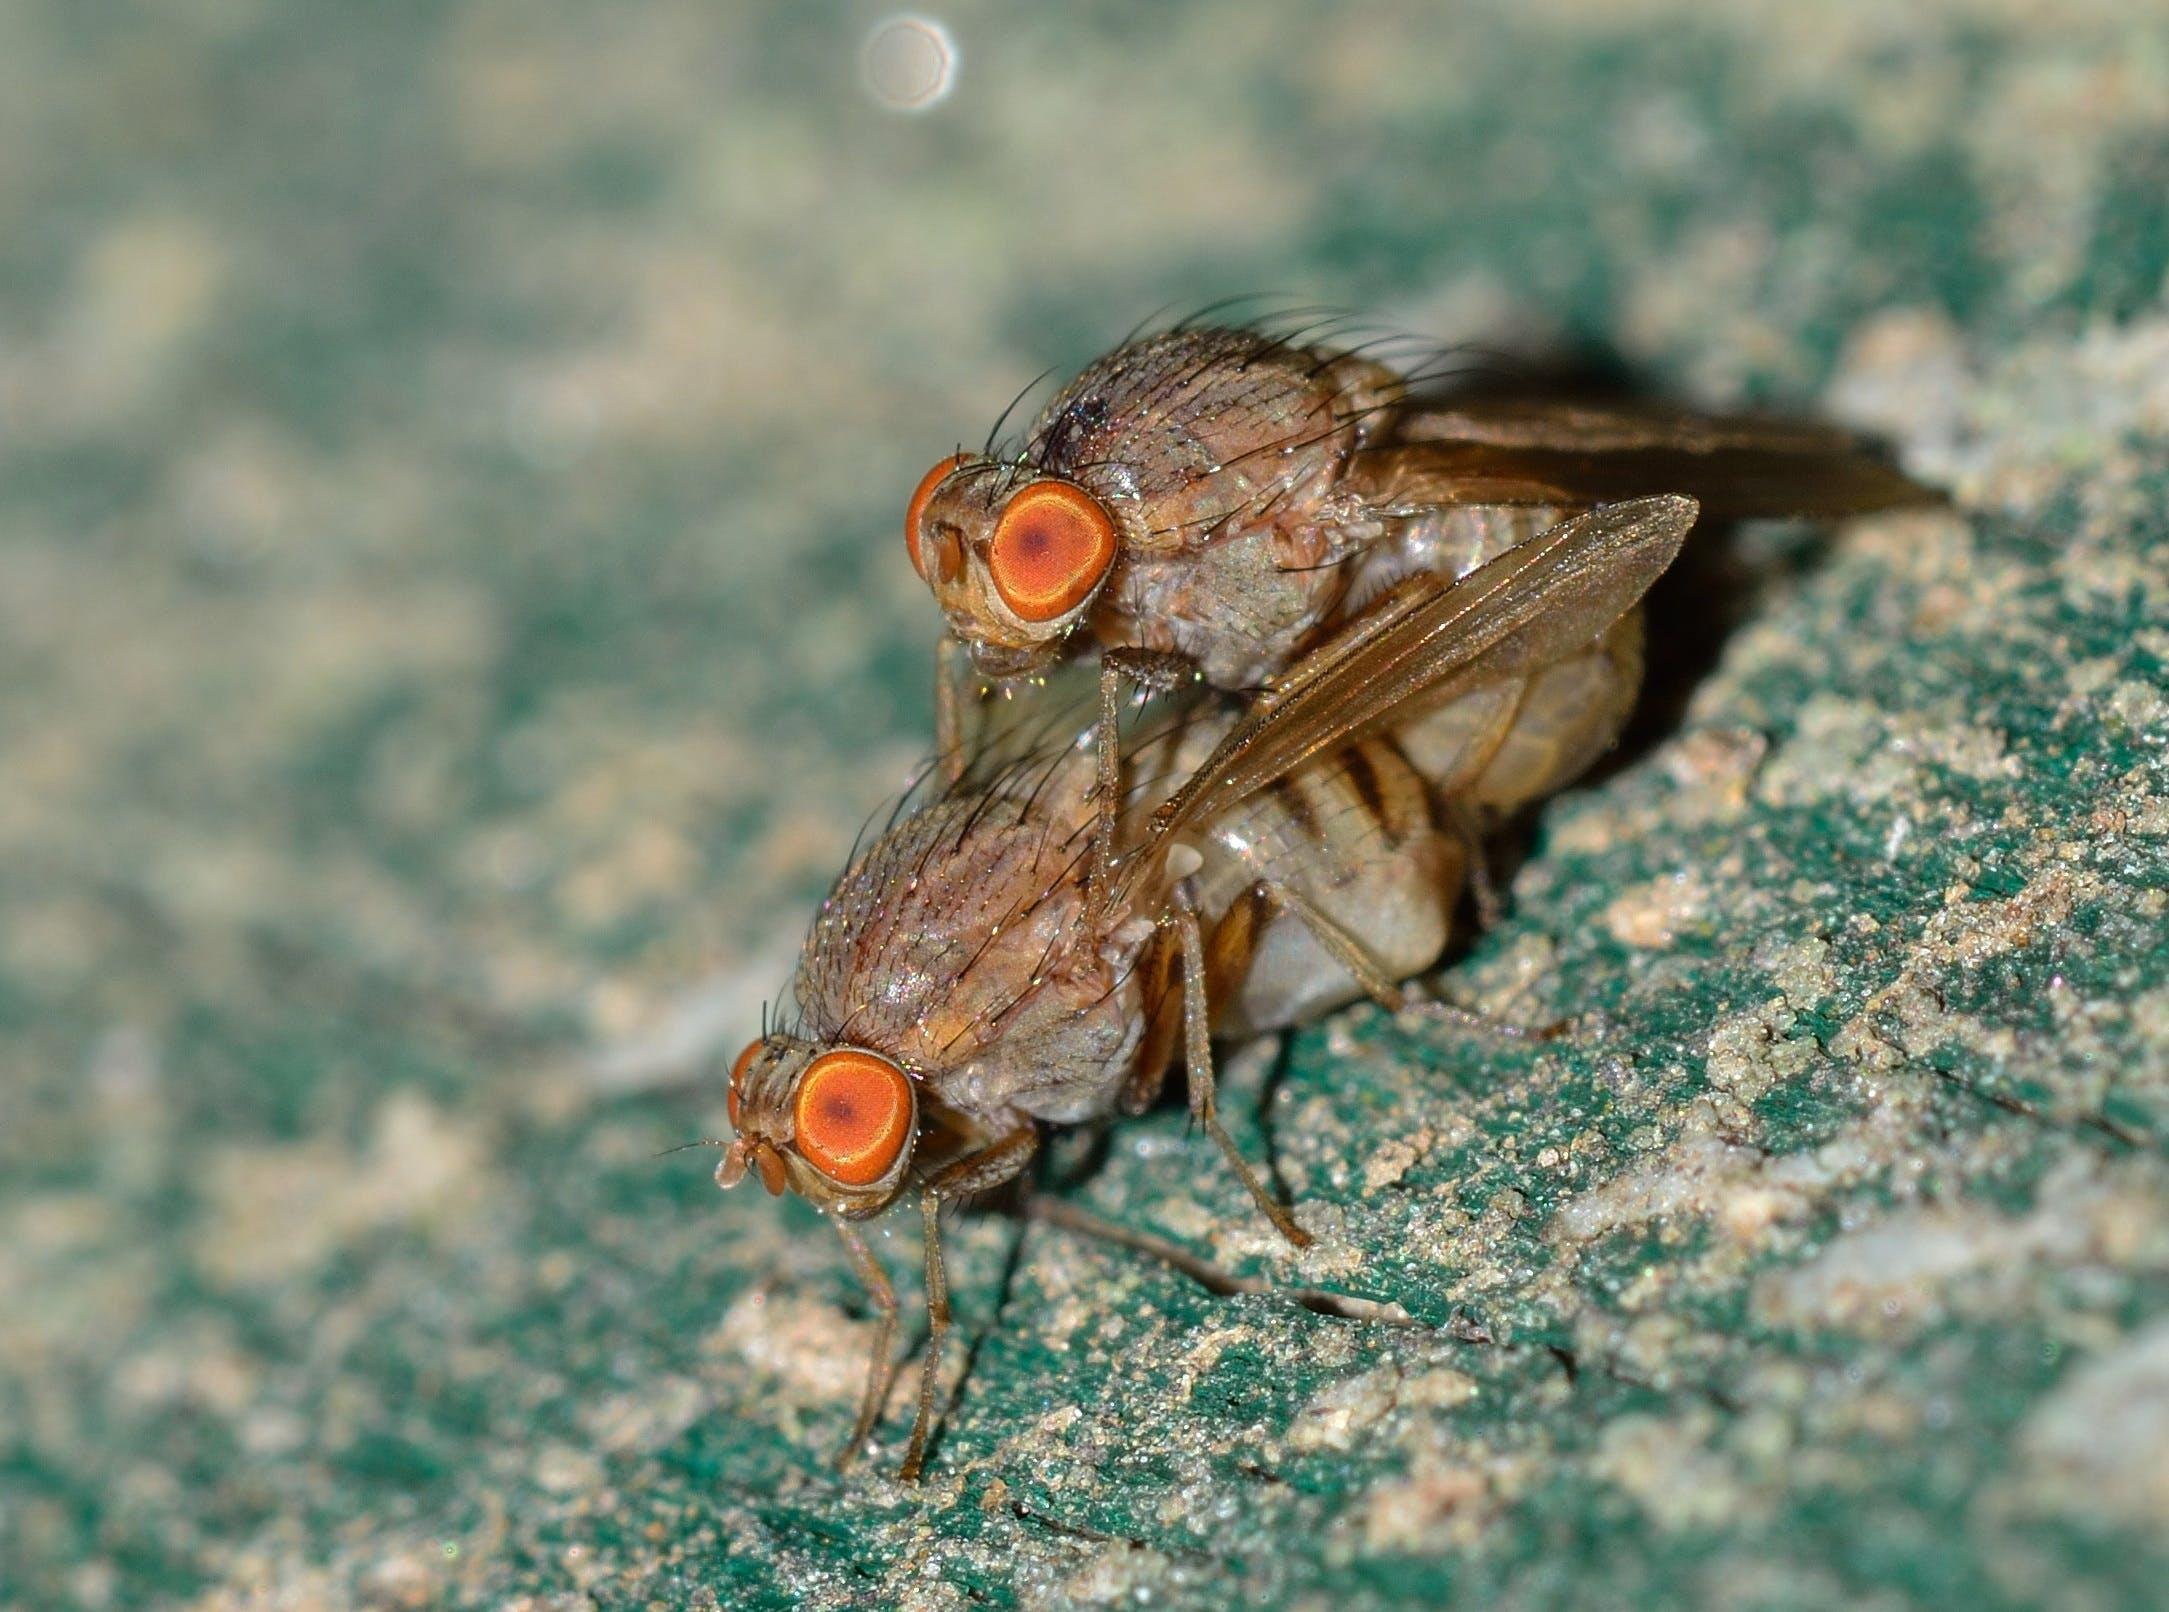 Kostenloses Stock Foto zu beady eye, facettenaugen, insekten, kupplung